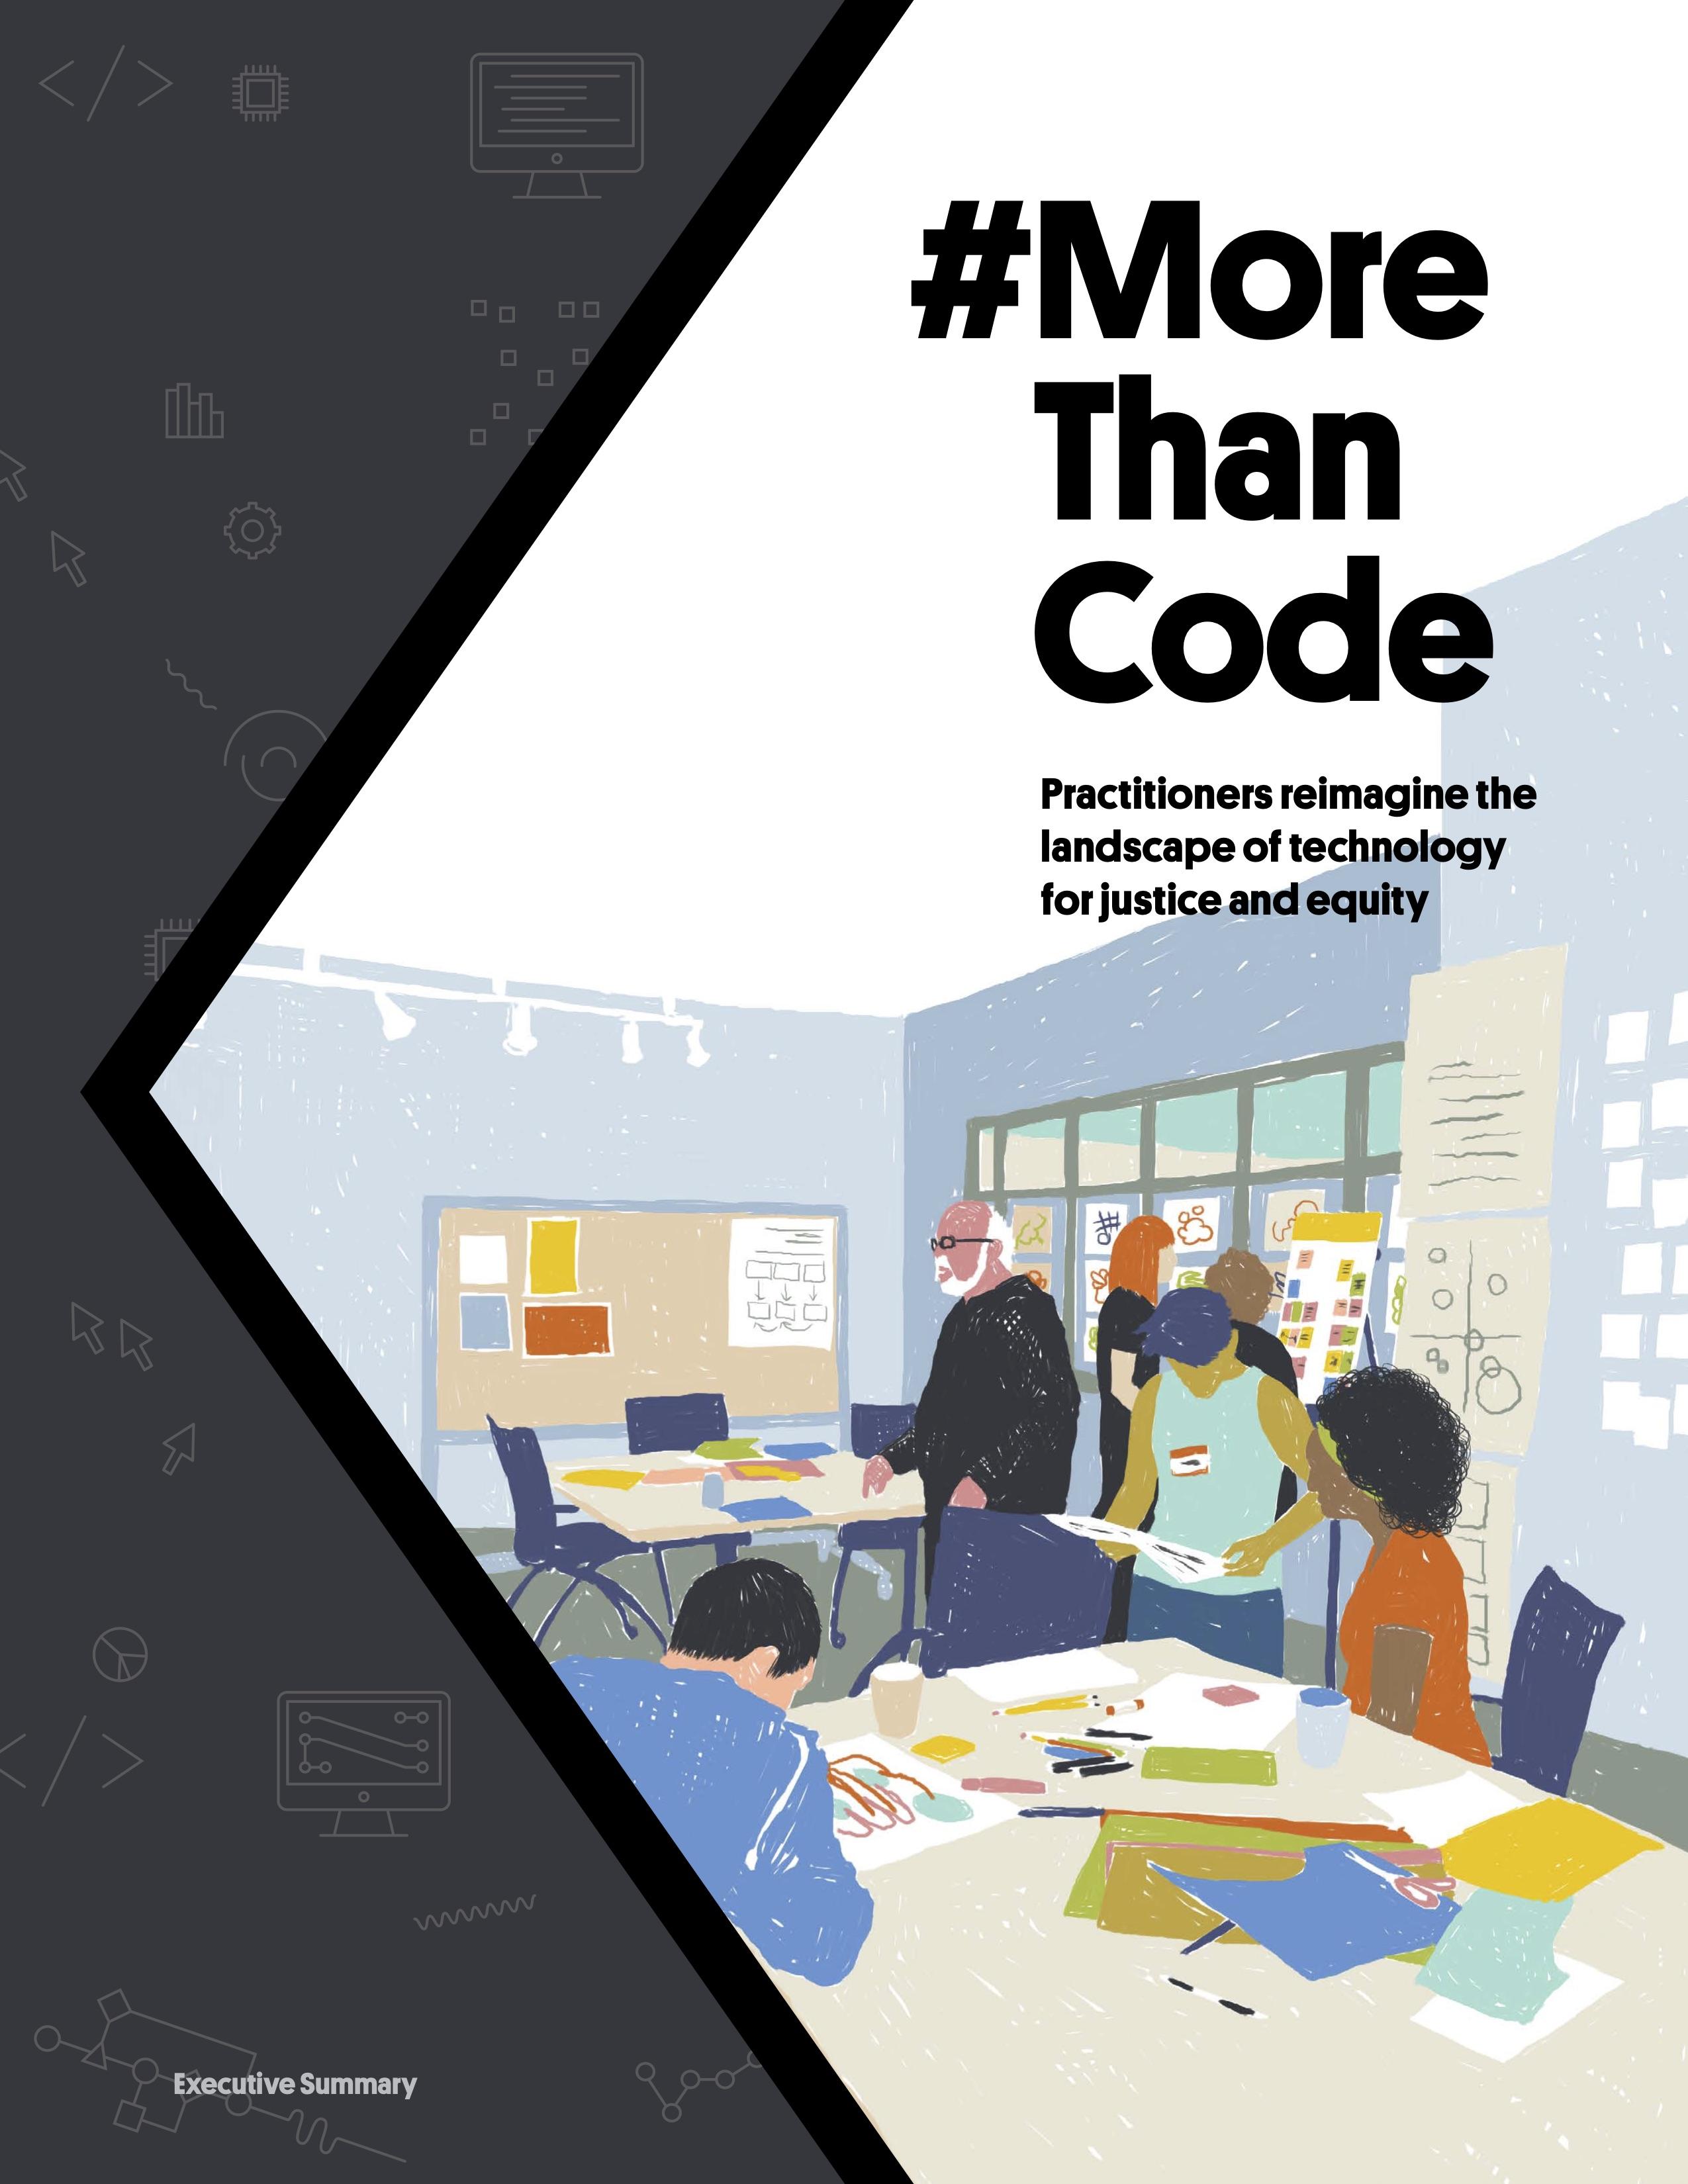 #MoreThanCode